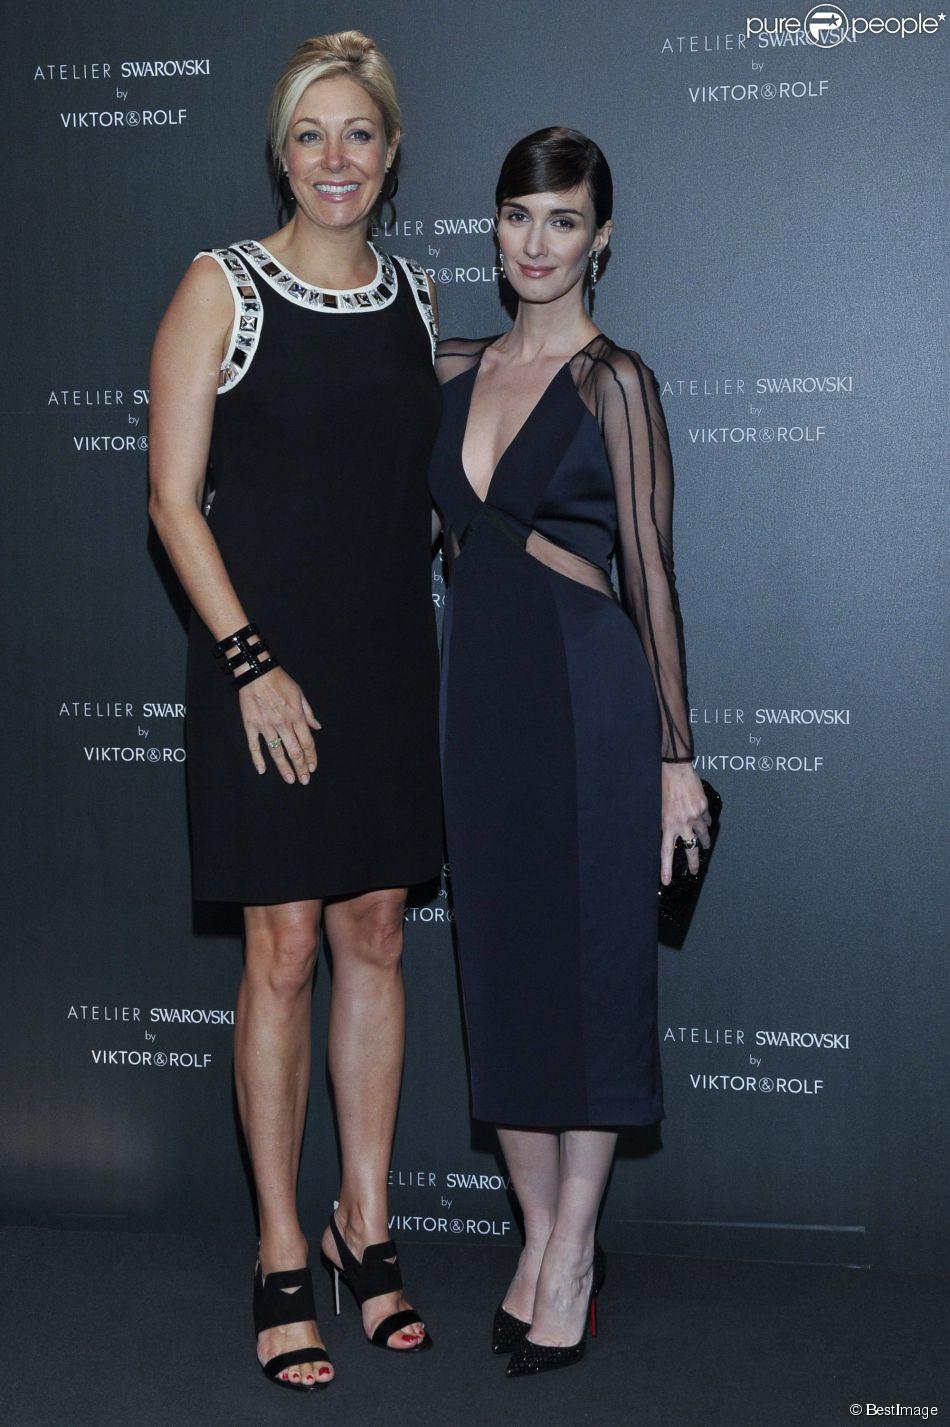 Nadja Swarovski et Paz Vega - Soirée Swarovski et Viktor & Rolf à l'Ecrin lors du 67e Festival international du film de Cannes, le 16 mai 2014